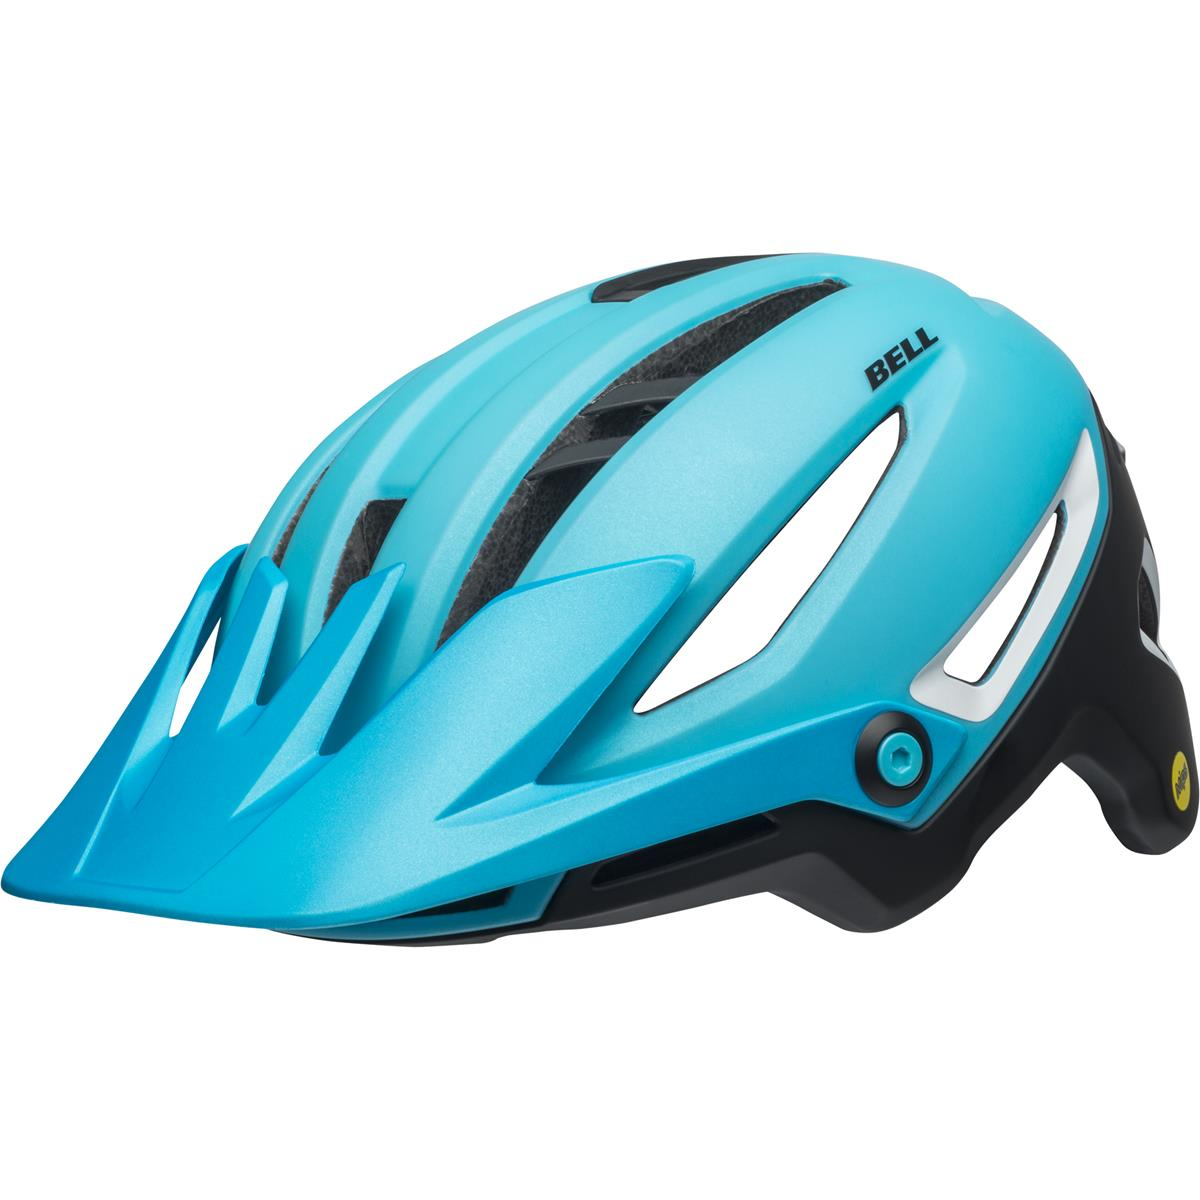 Bell Enduro-MTB Helm Sixer MIPS Ridgeline - Matt Hellblau/Schwarz